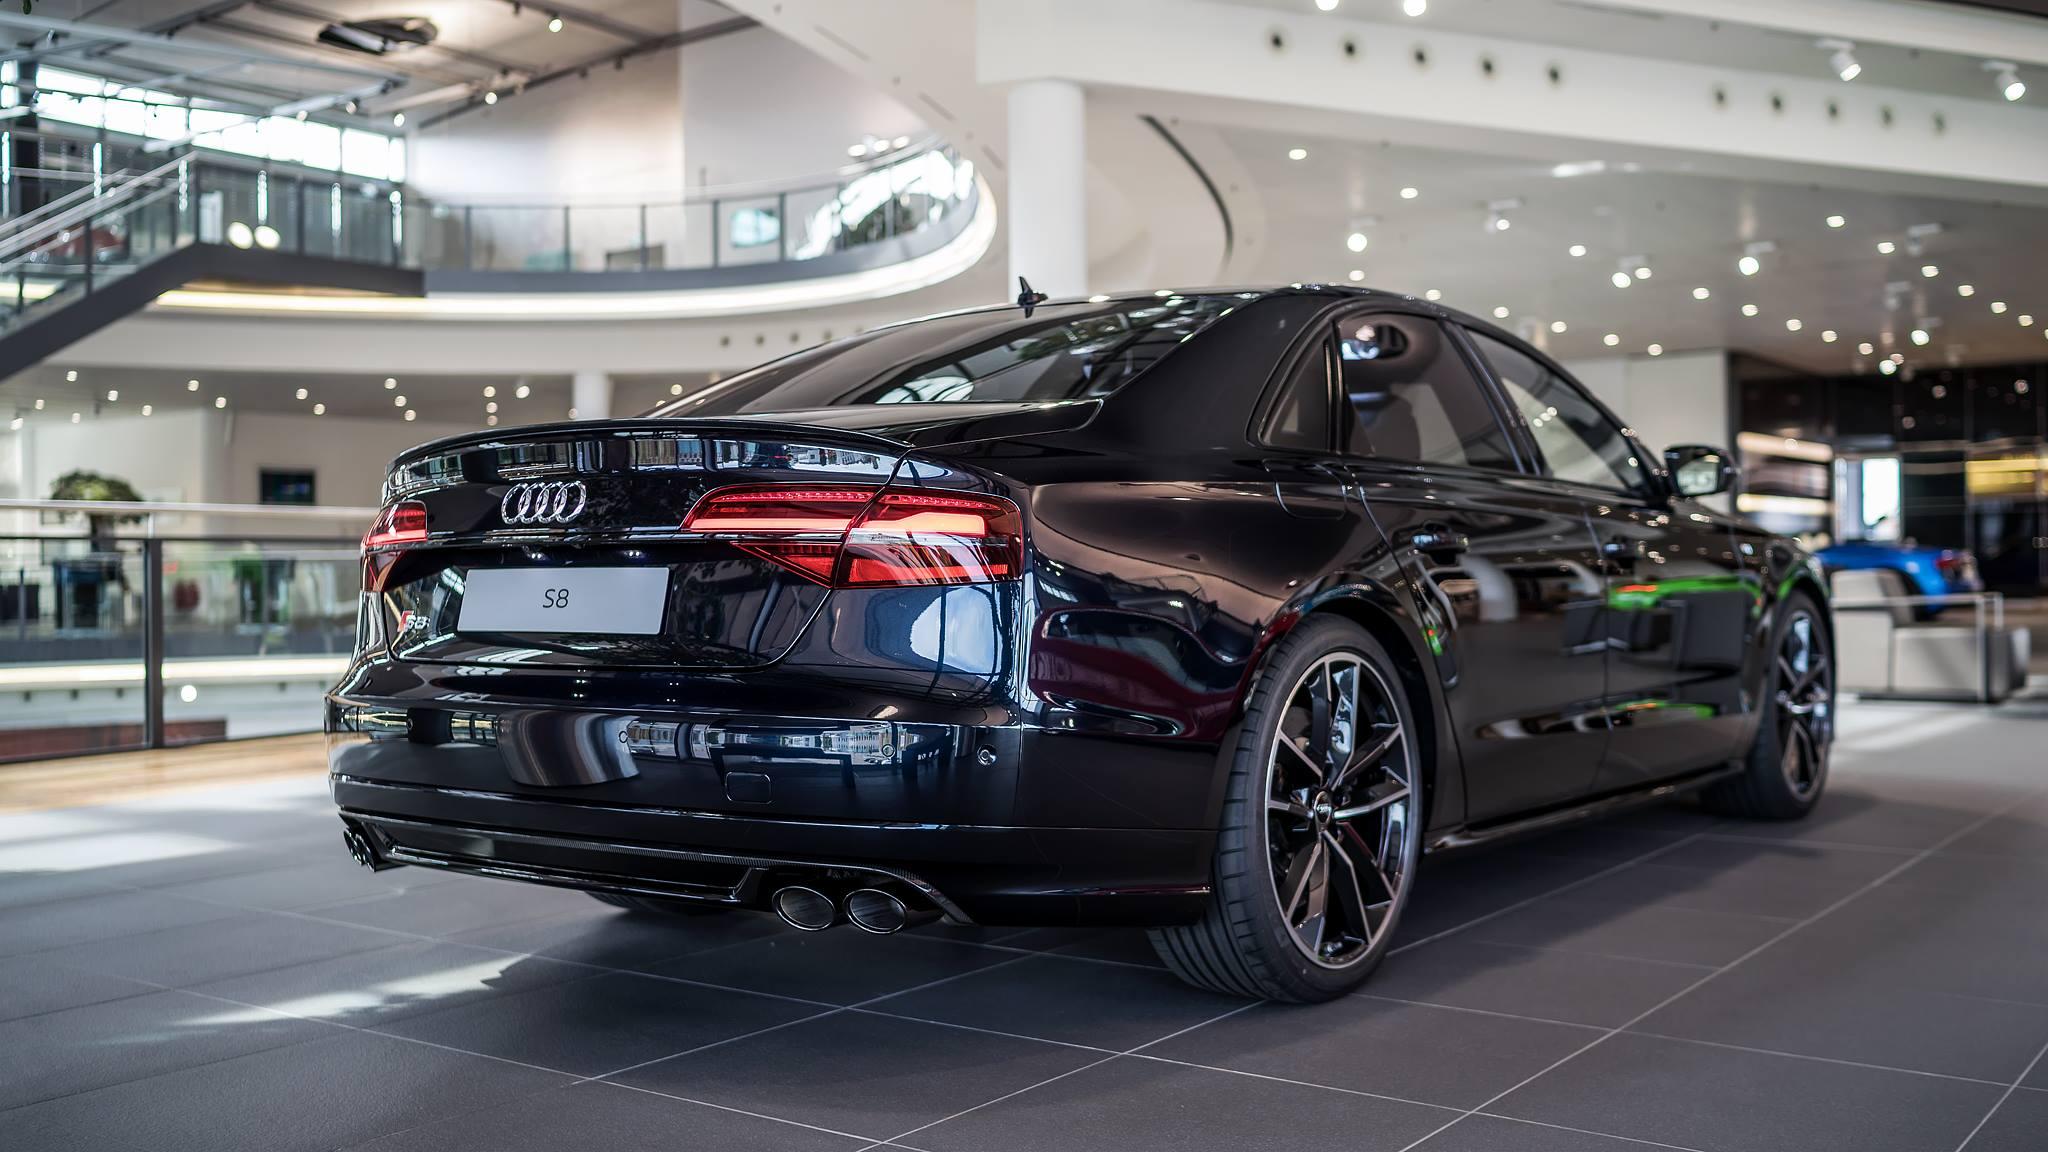 Audi S8 Plus in Carbon Schwarz Metallic - Photos